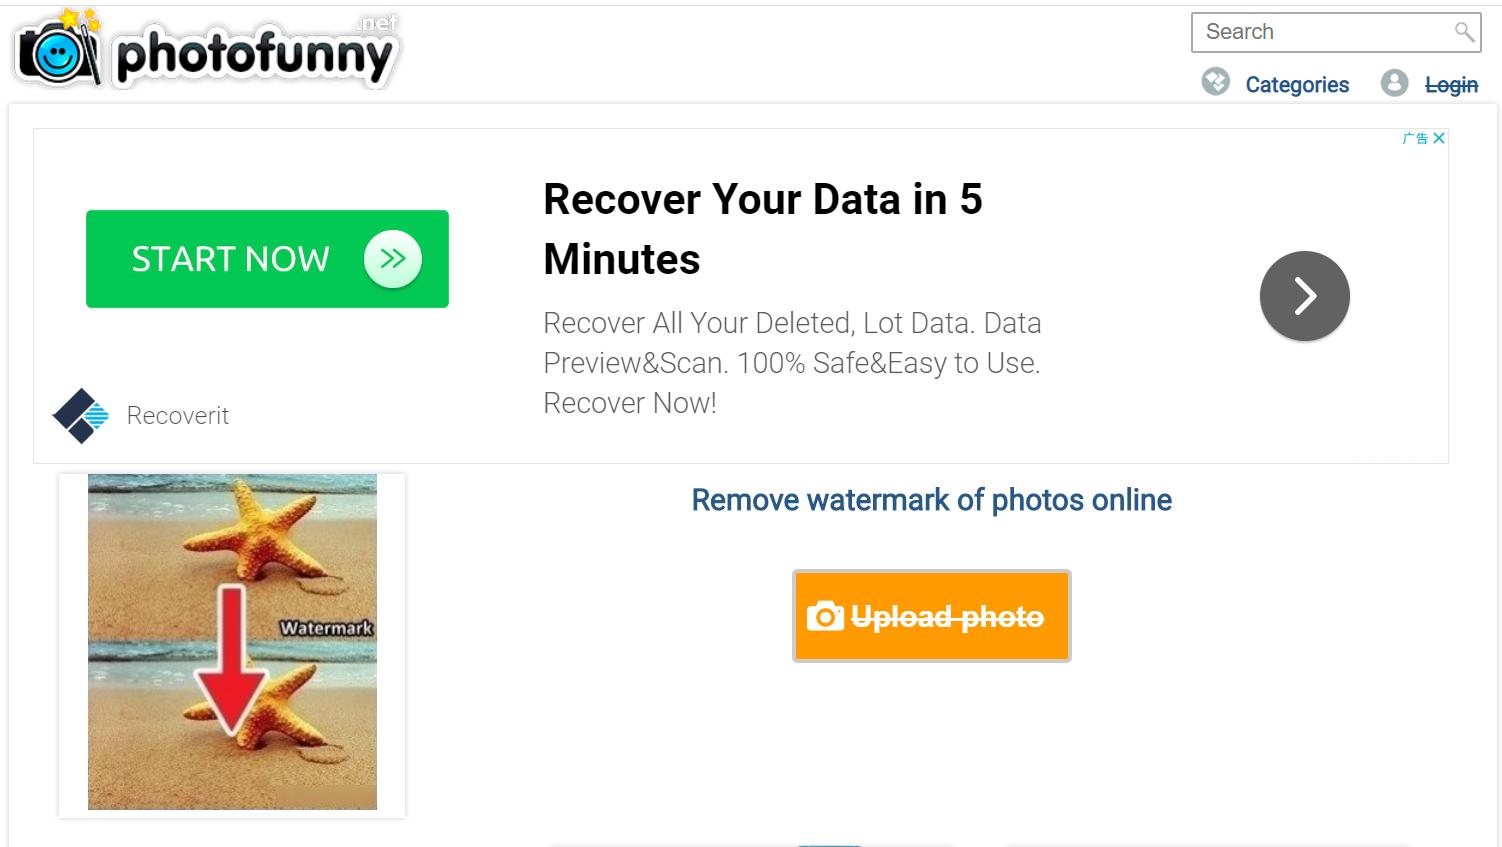 photofunny-watermark-remover